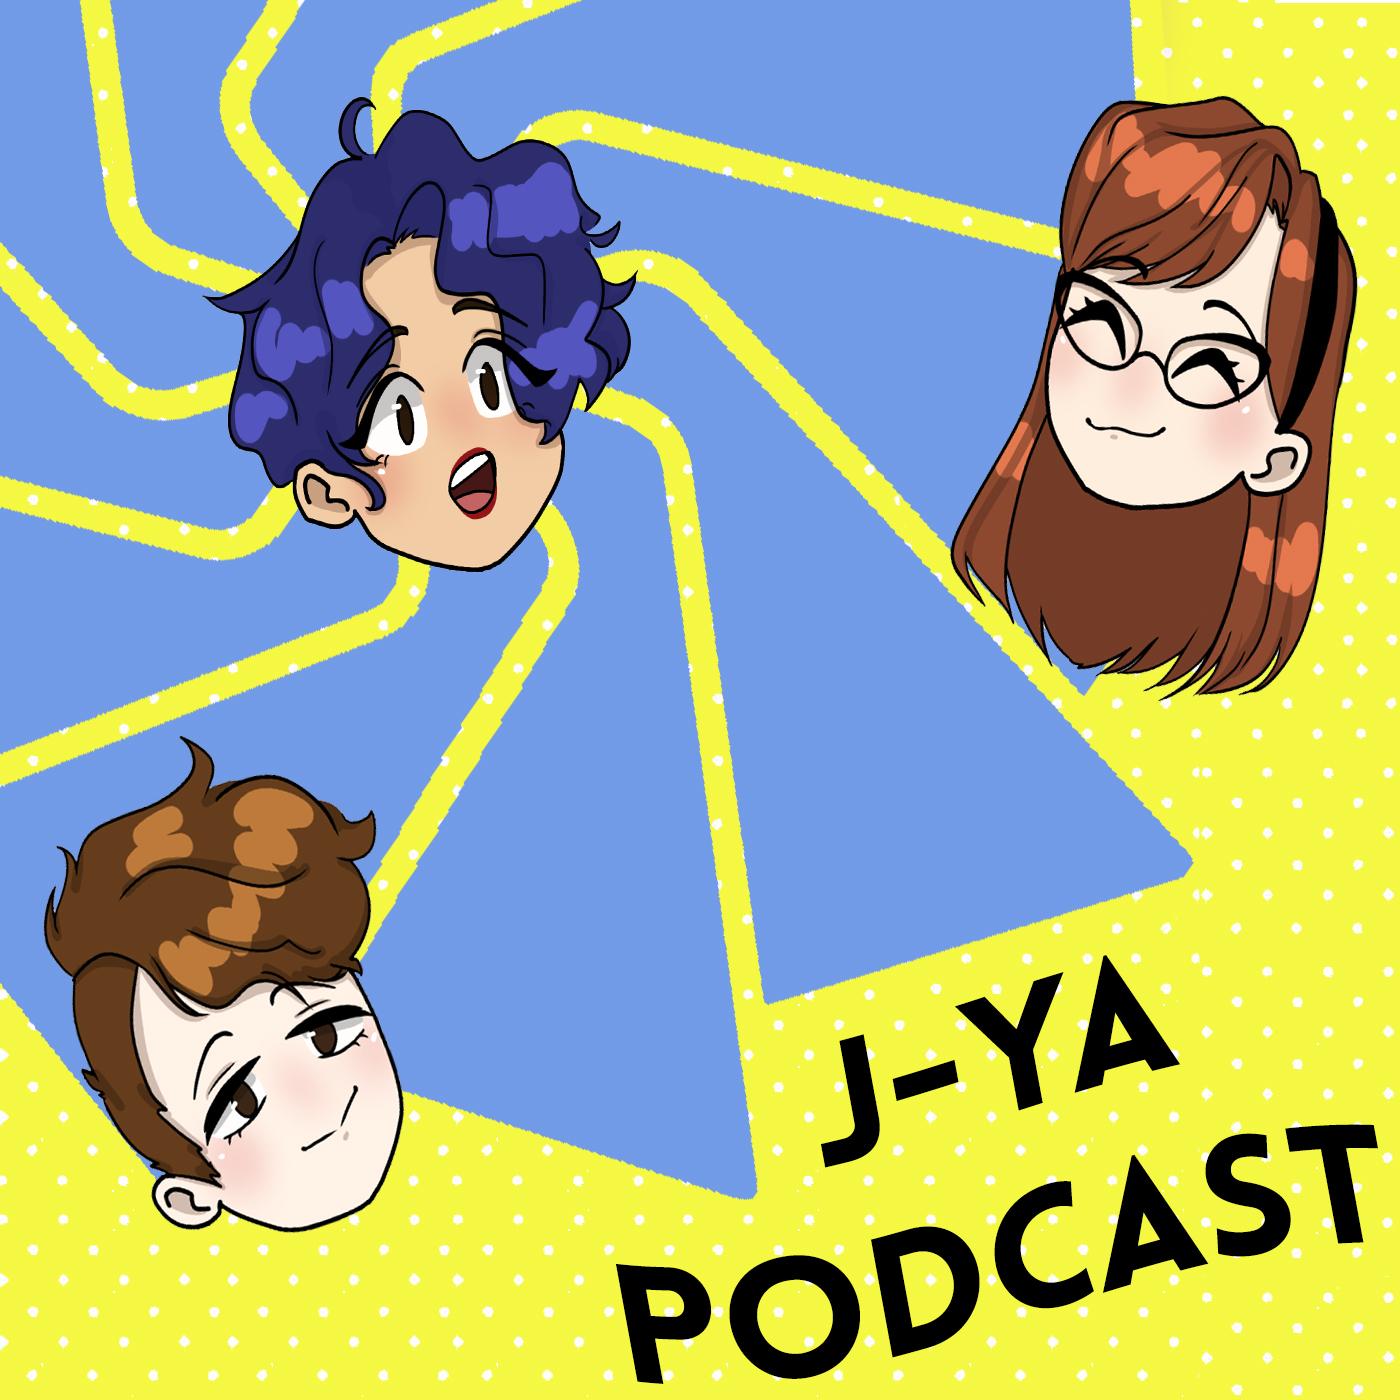 J-Ya Podcast Logo Real